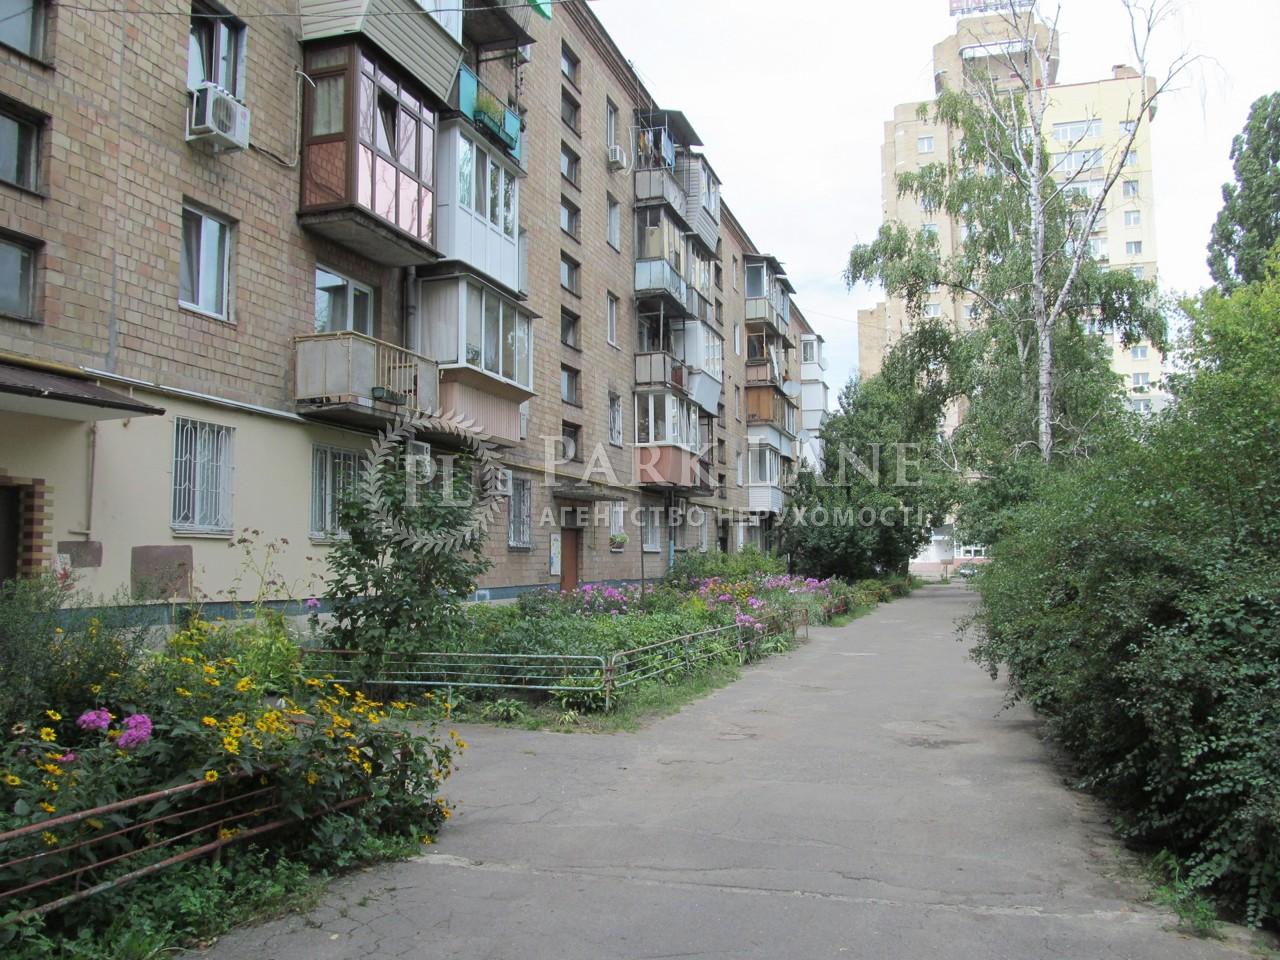 Квартира ул. Довженко, 12, Киев, R-35965 - Фото 1